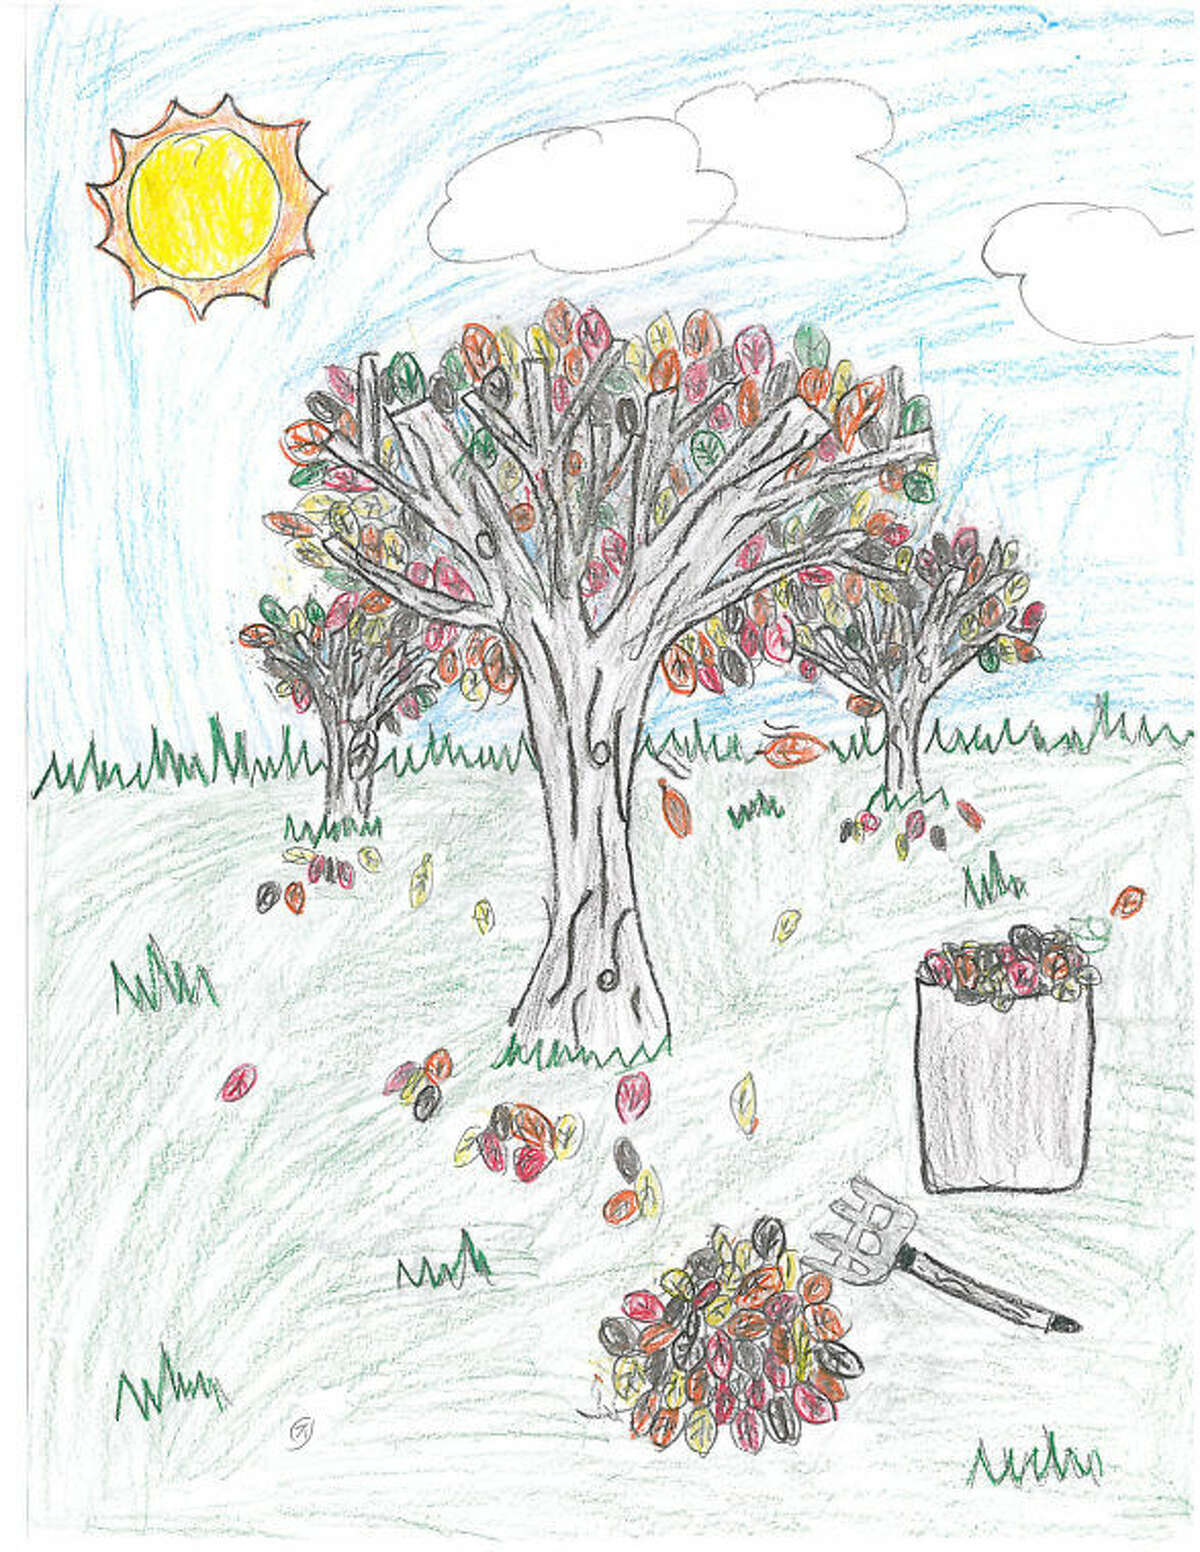 Nayeli Olivia-Reyes Grade 5 Side by Side Charter School